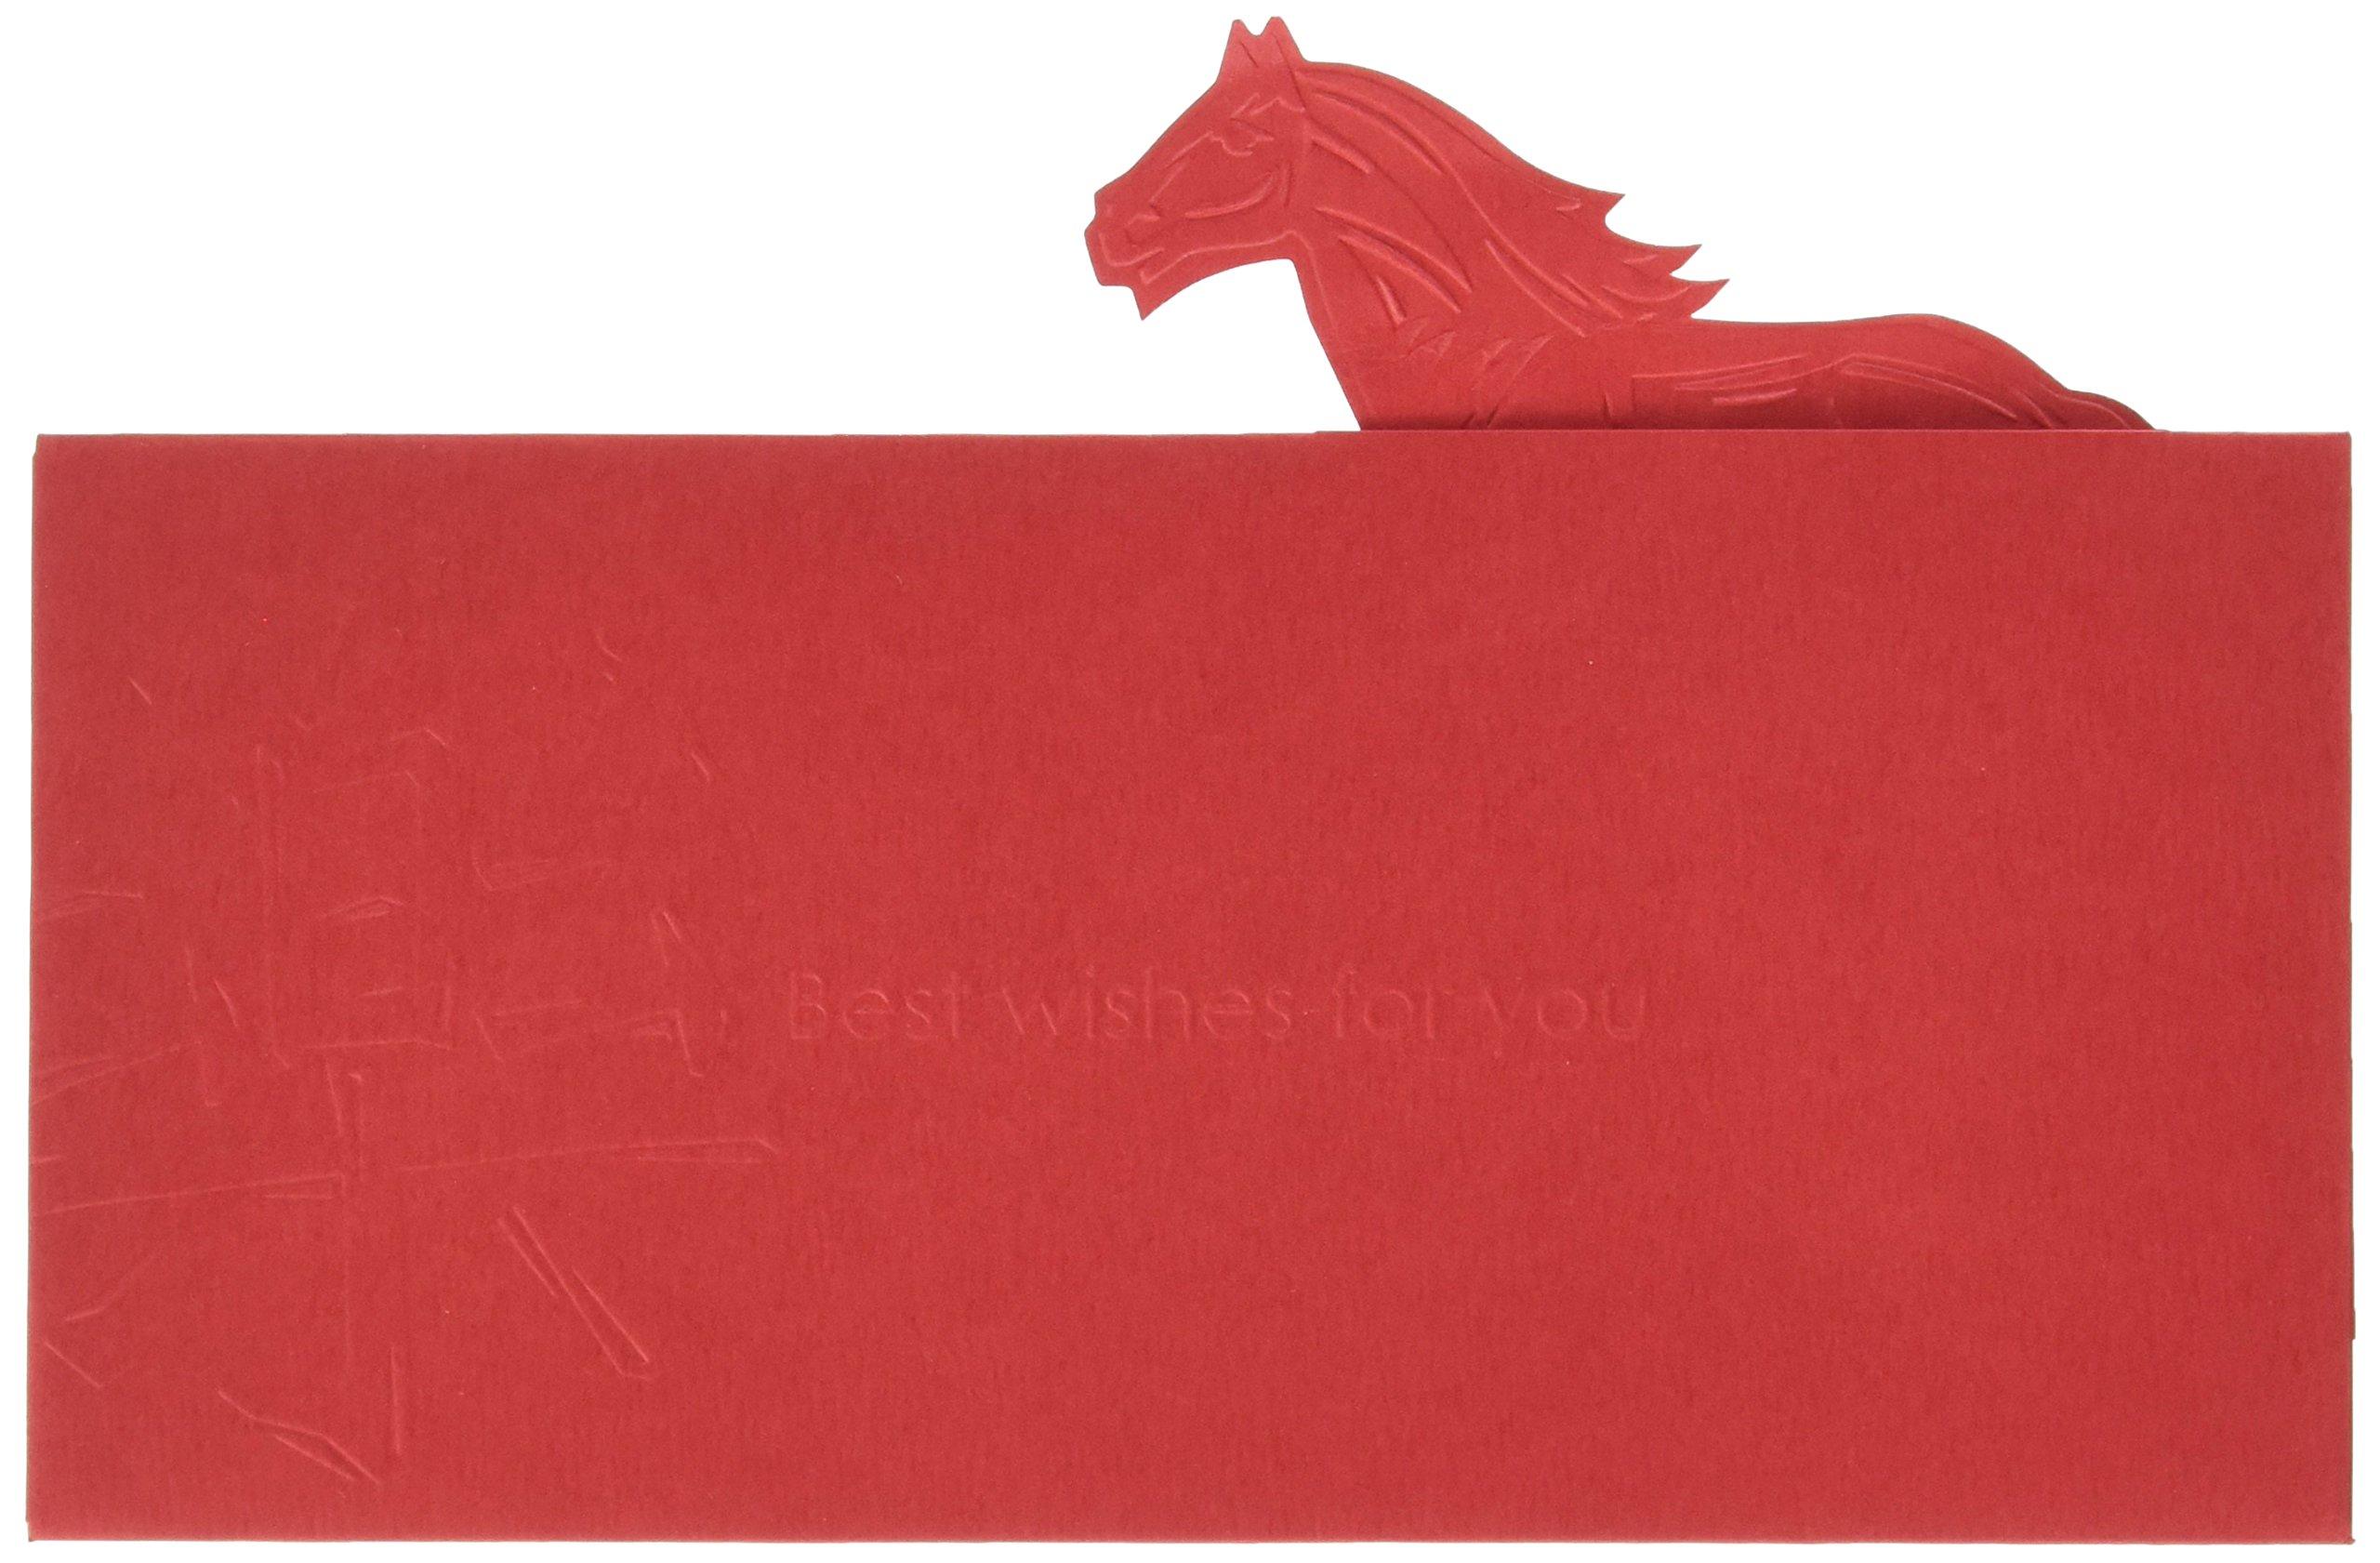 Fun Ii Chinese New Year Red Envelope Galloping Horse Gift